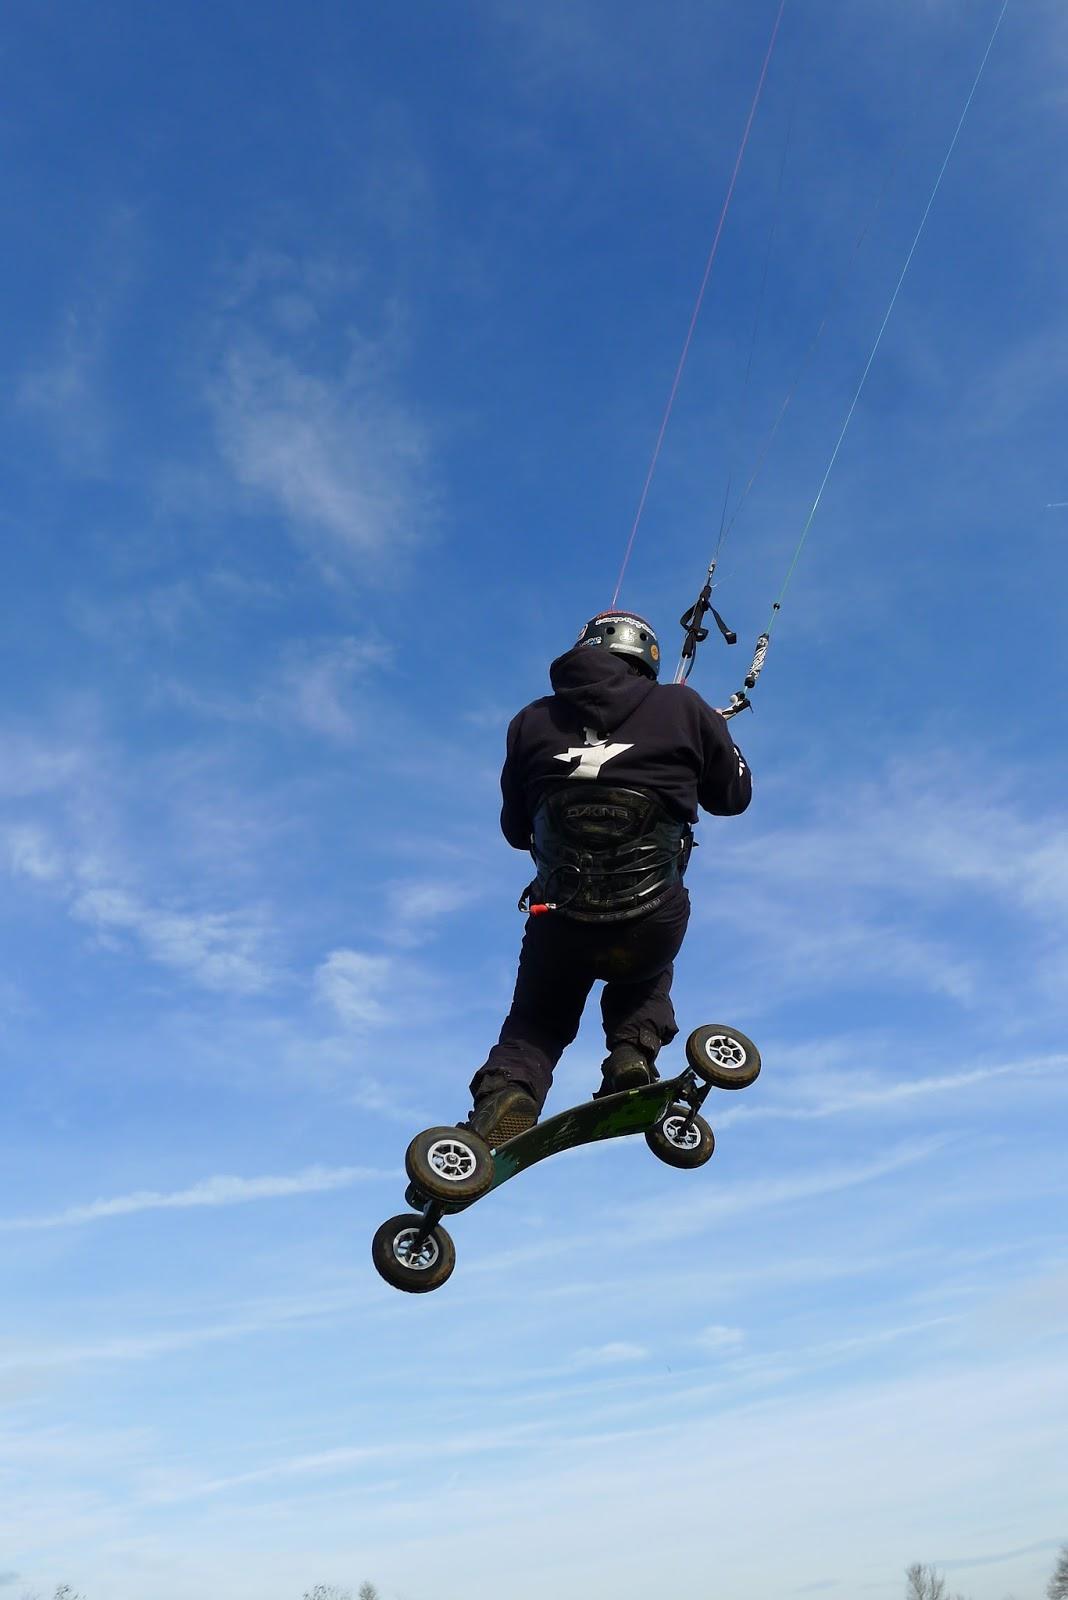 VENDUE ! Flysurfer Speed IV Lotus 18m complète 1390 € quasi neuve  P1260113